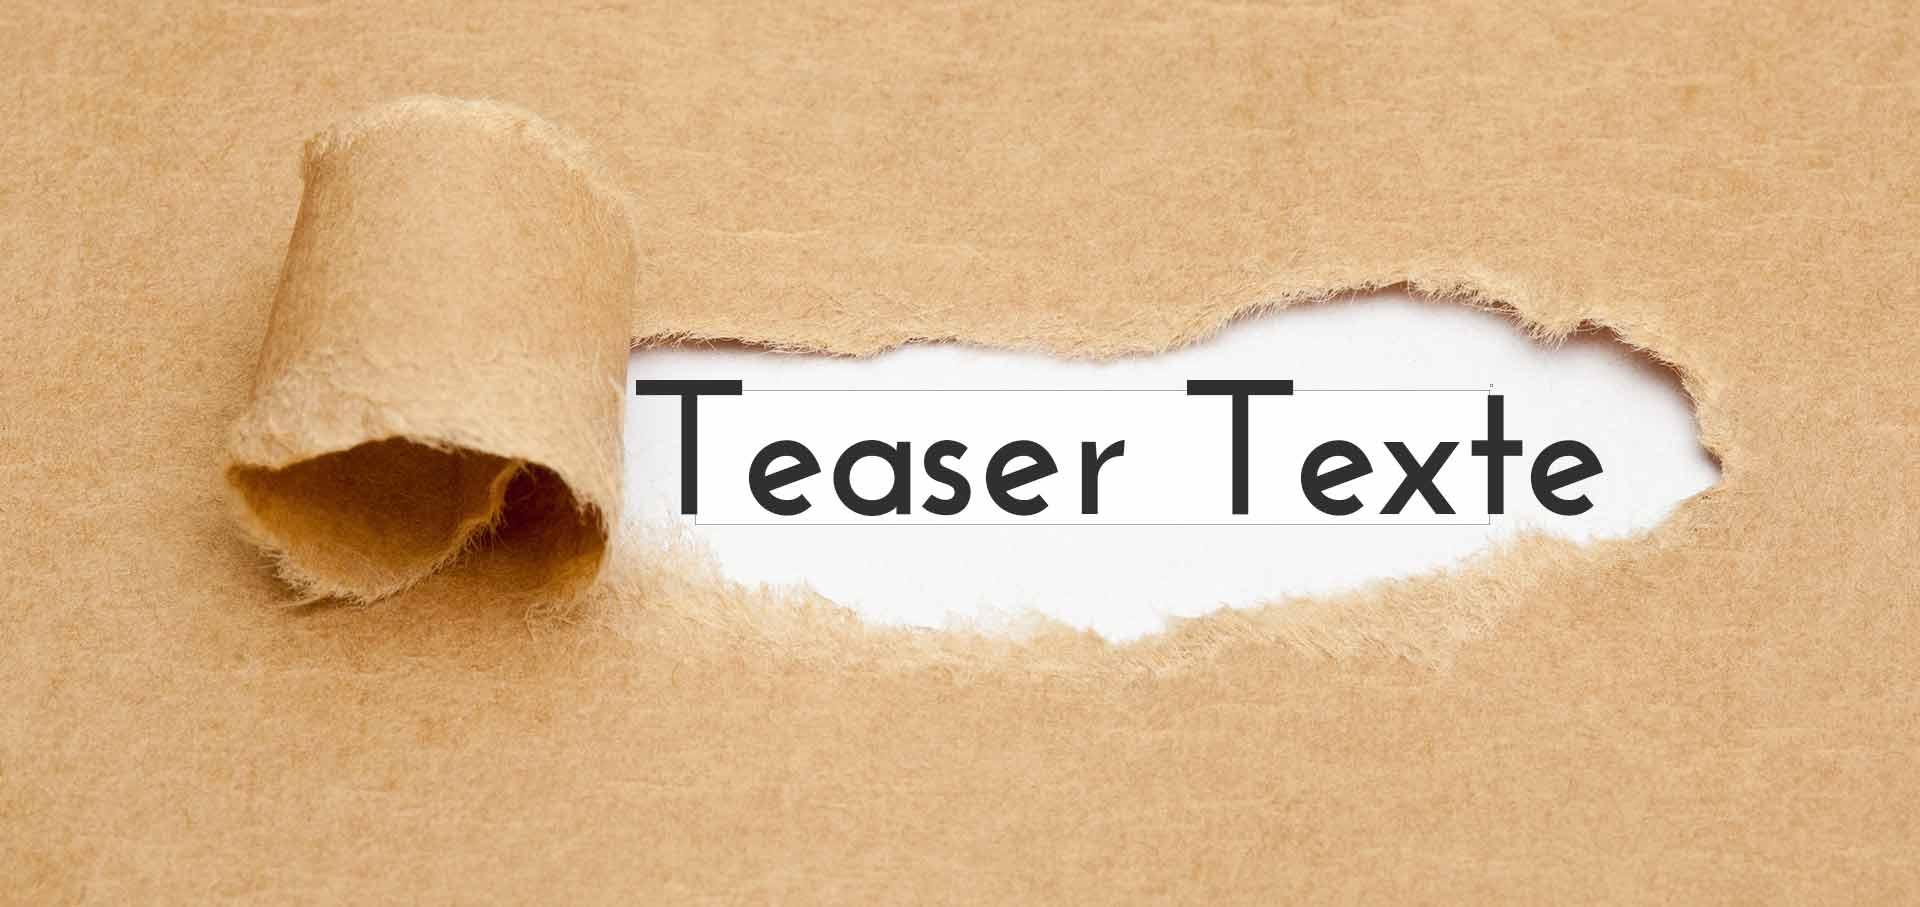 Teaser Texte